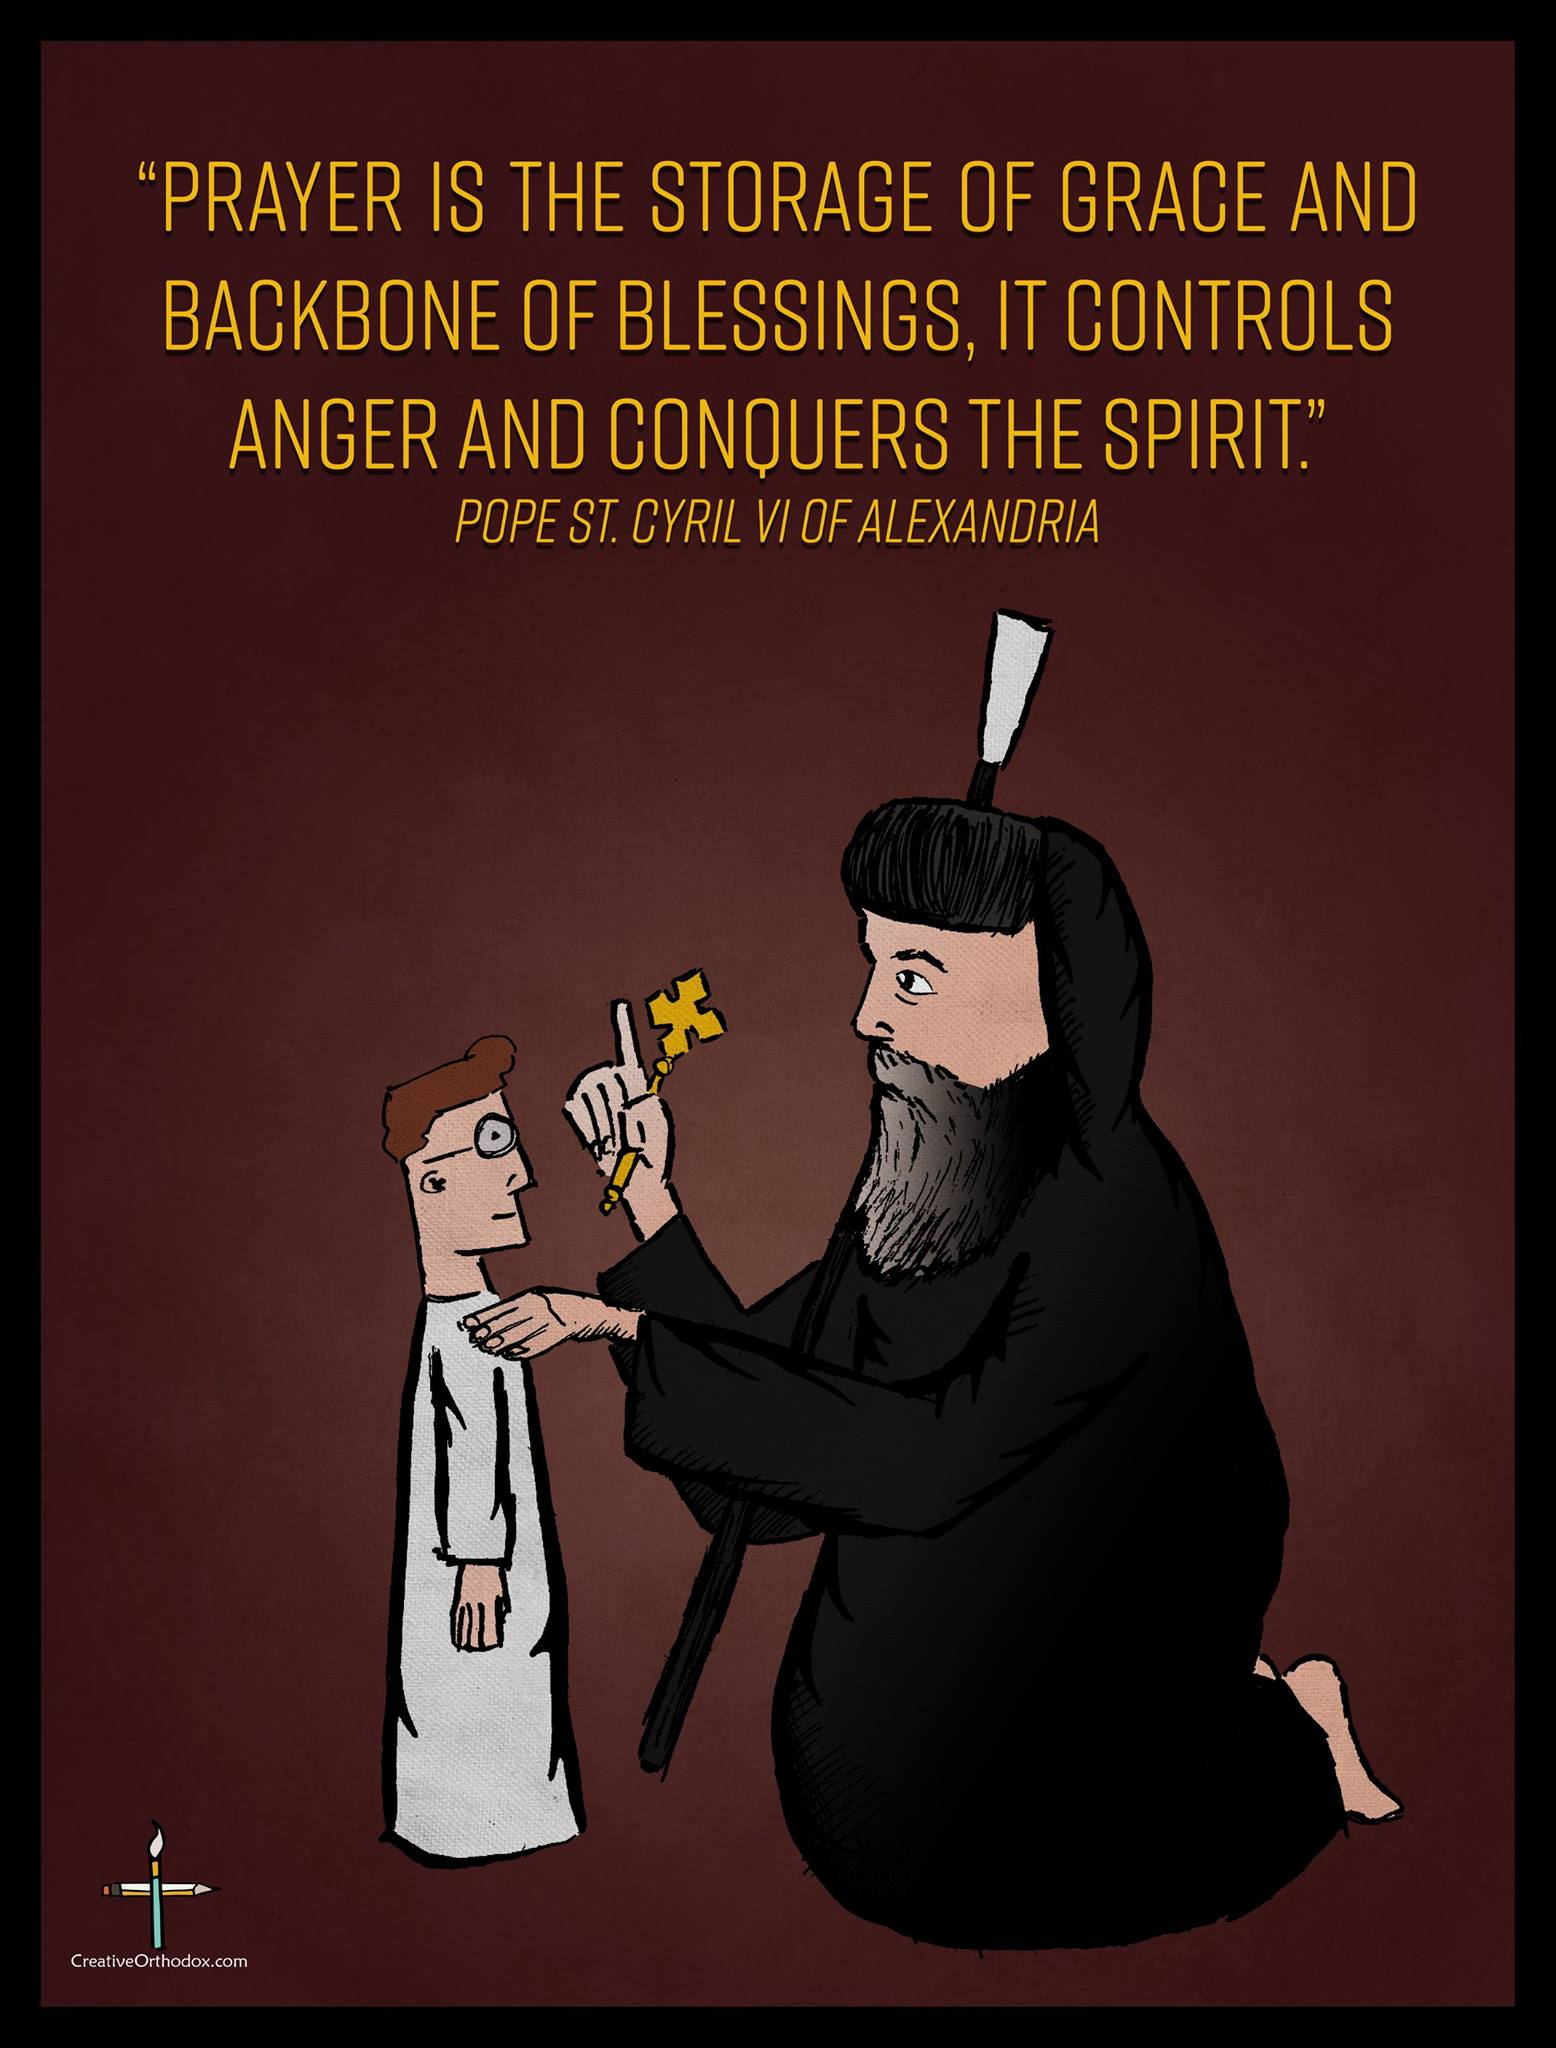 Saint Pope Kyrillos (Cyril) on Prayer